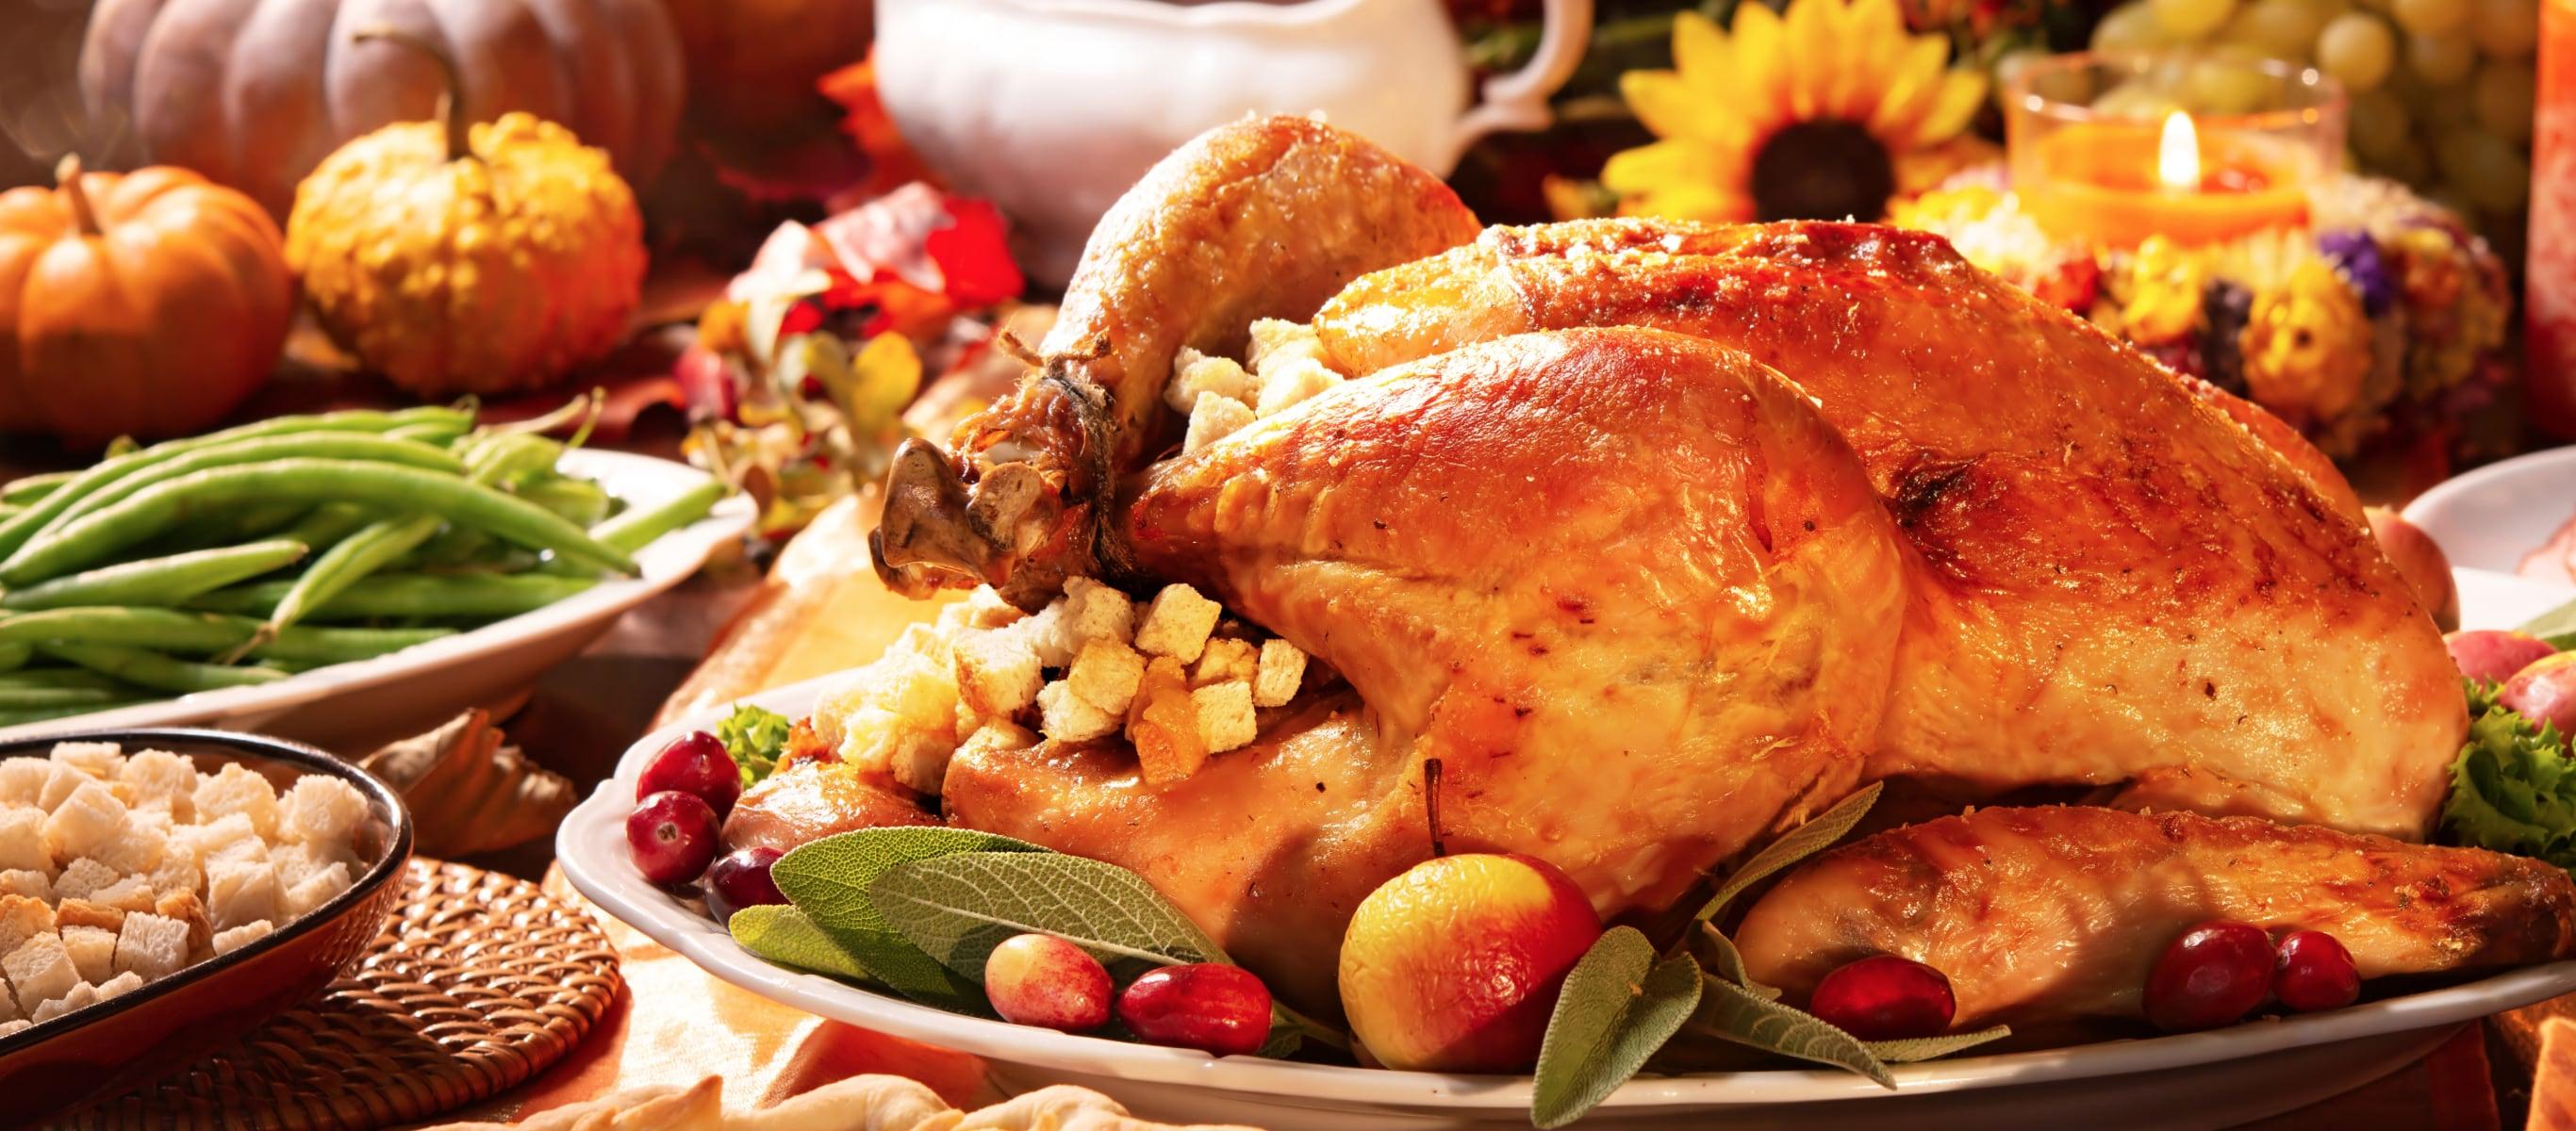 Feast of Gratitude